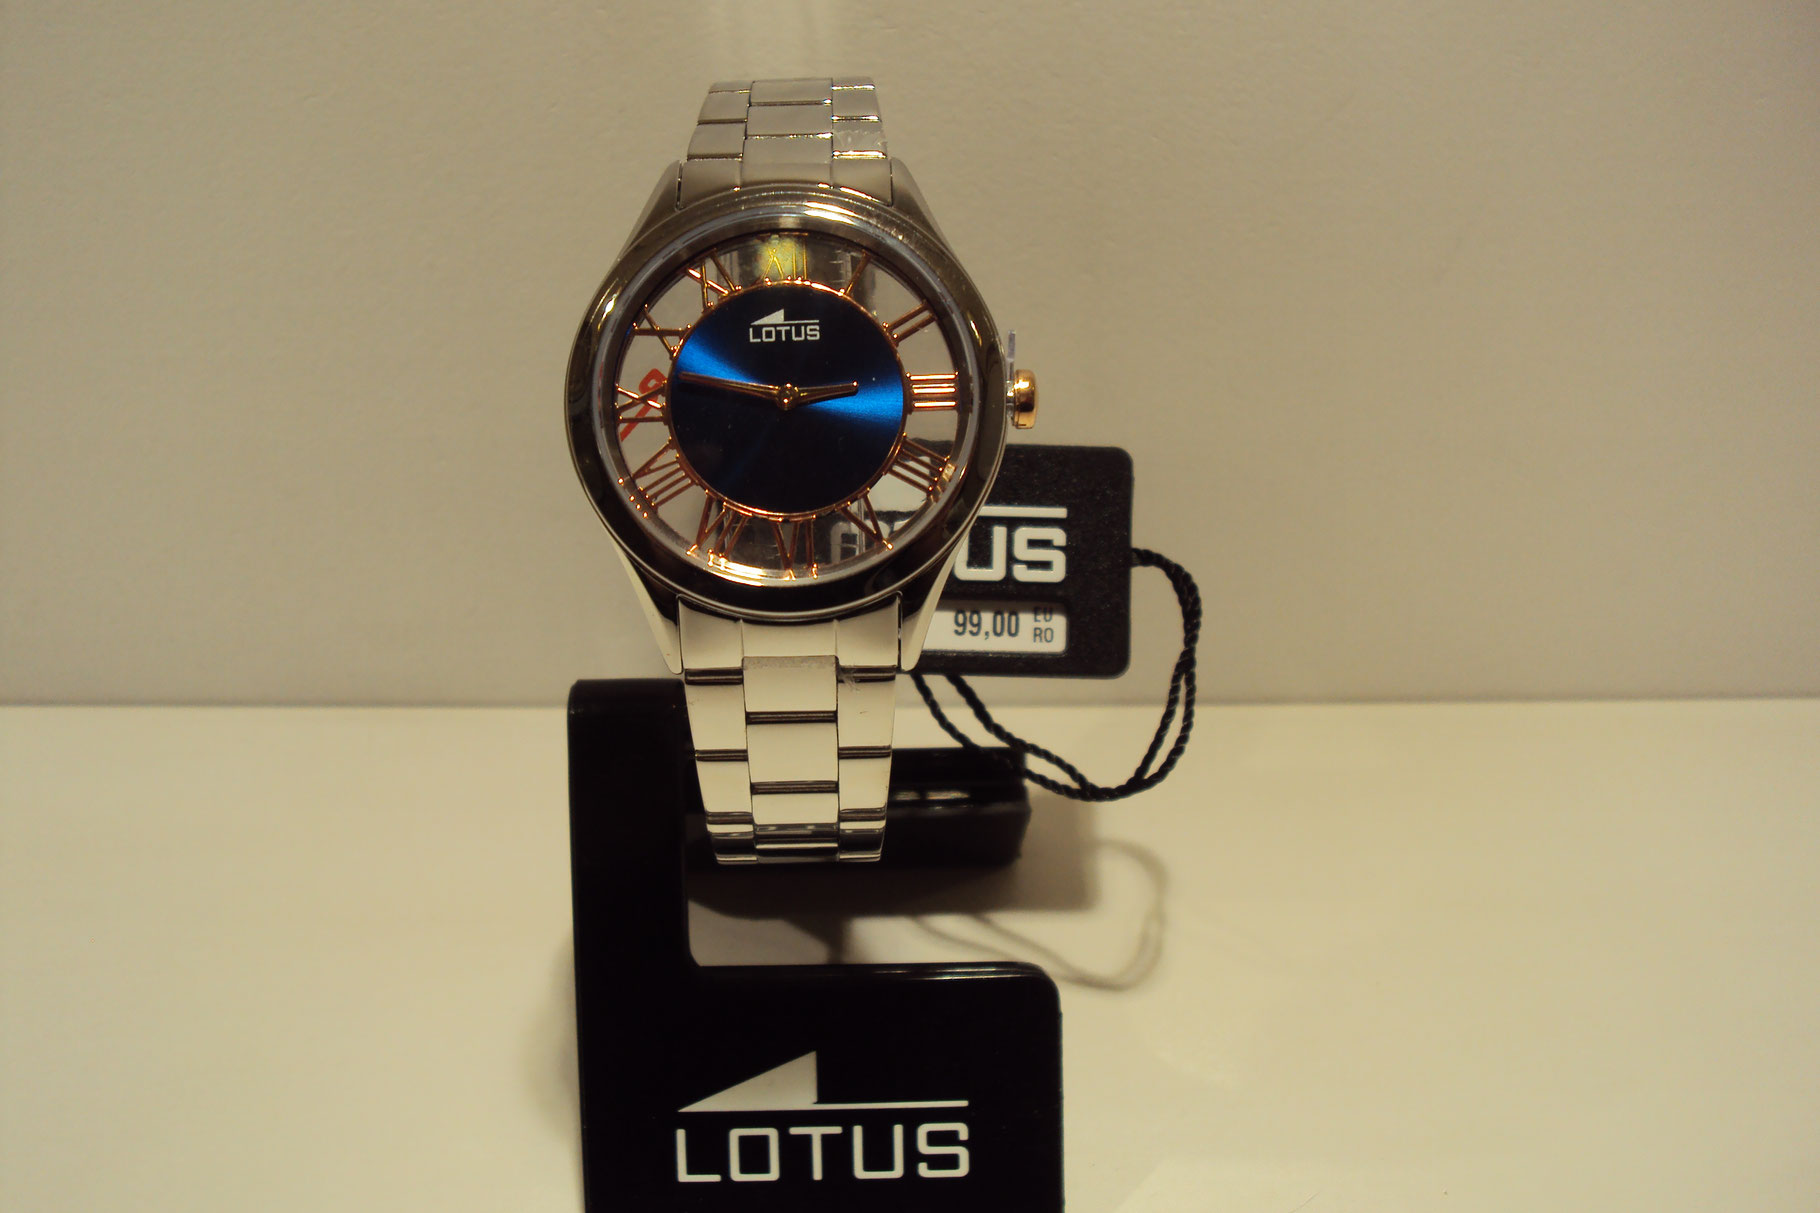 Reloj mujer Lotus fondo transparente,azul eléctrico y cobrizo.99€